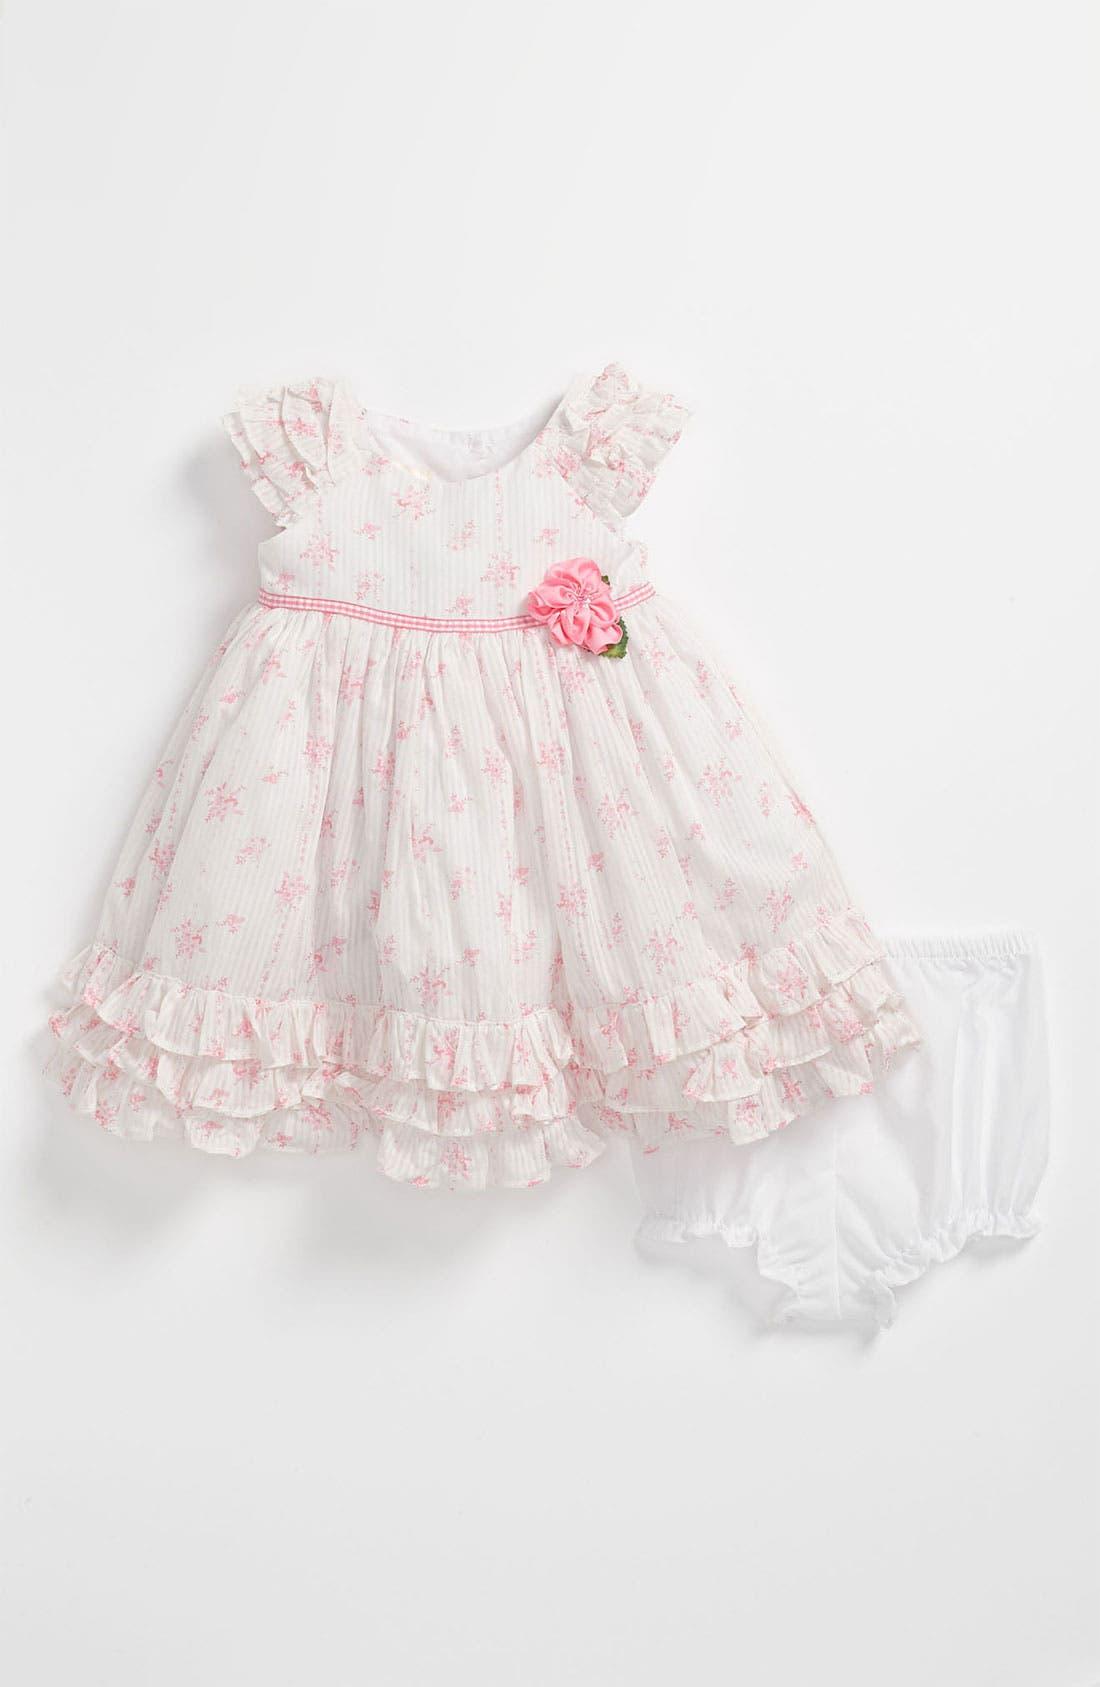 Main Image - Laura Ashley Wallpaper Print Dress & Bloomers (Infant)